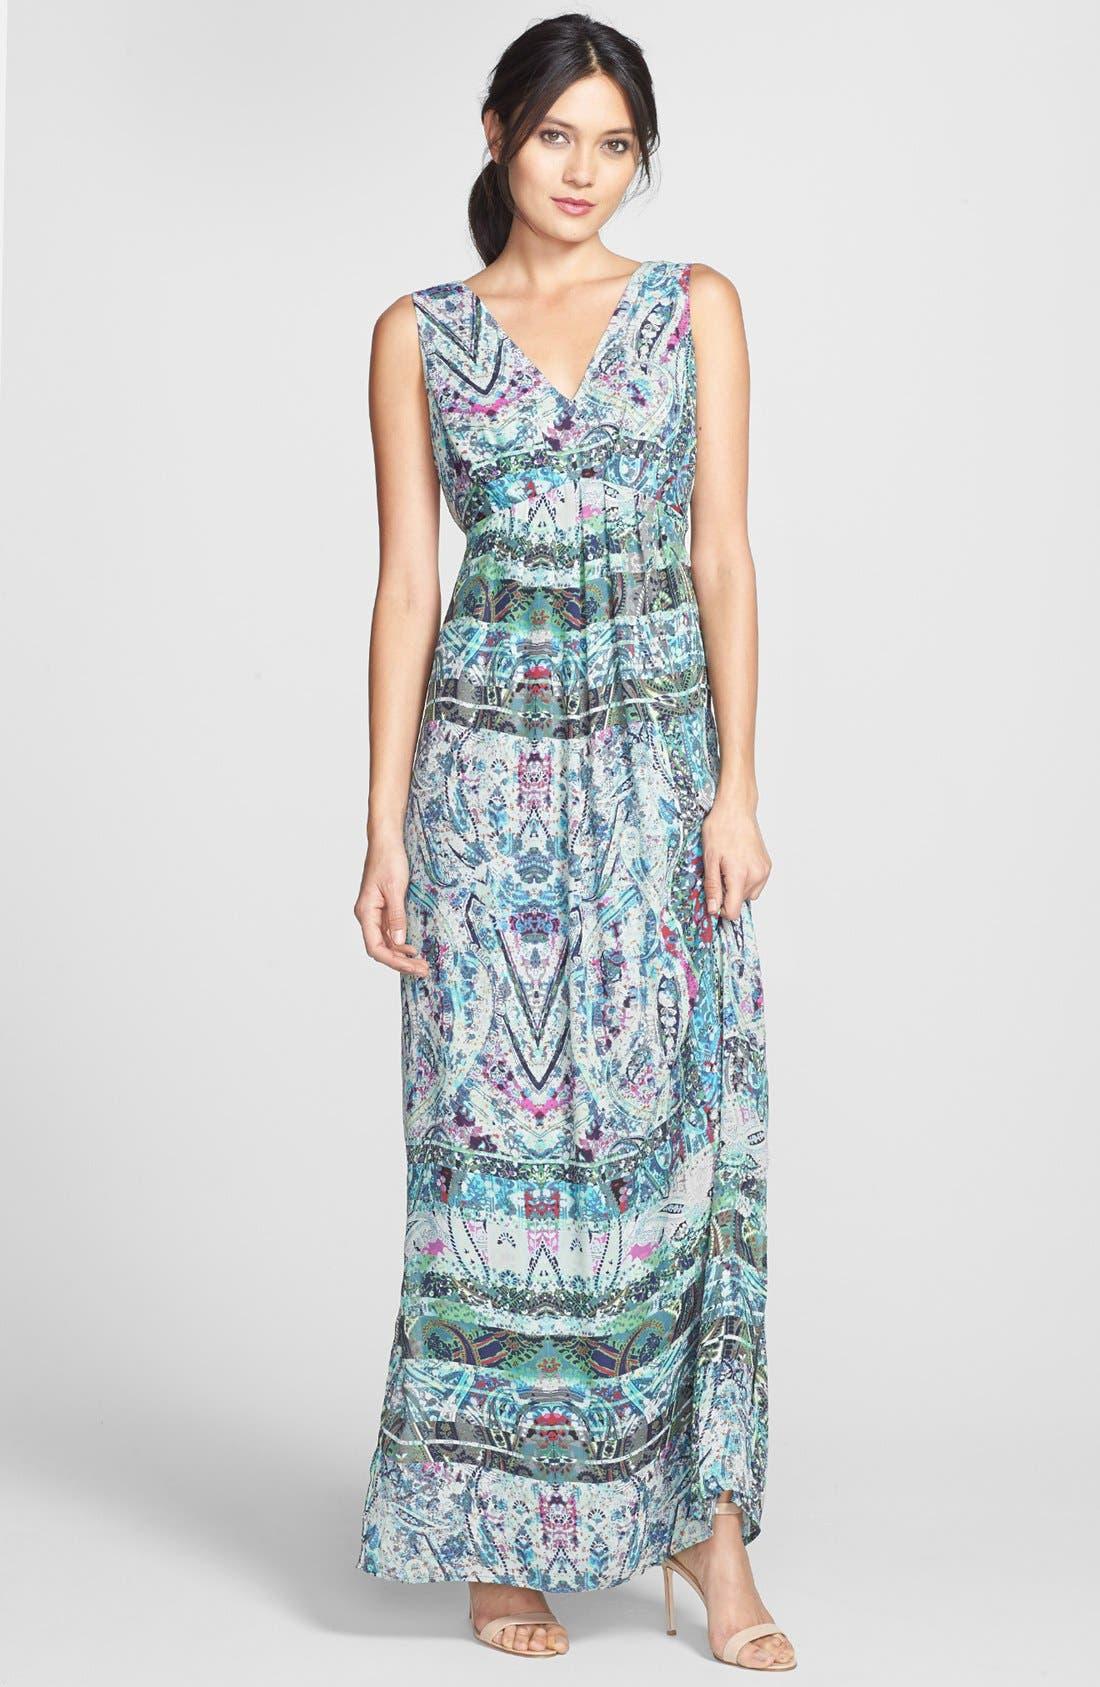 Alternate Image 1 Selected - Presley Skye Print Woven Maxi Dress